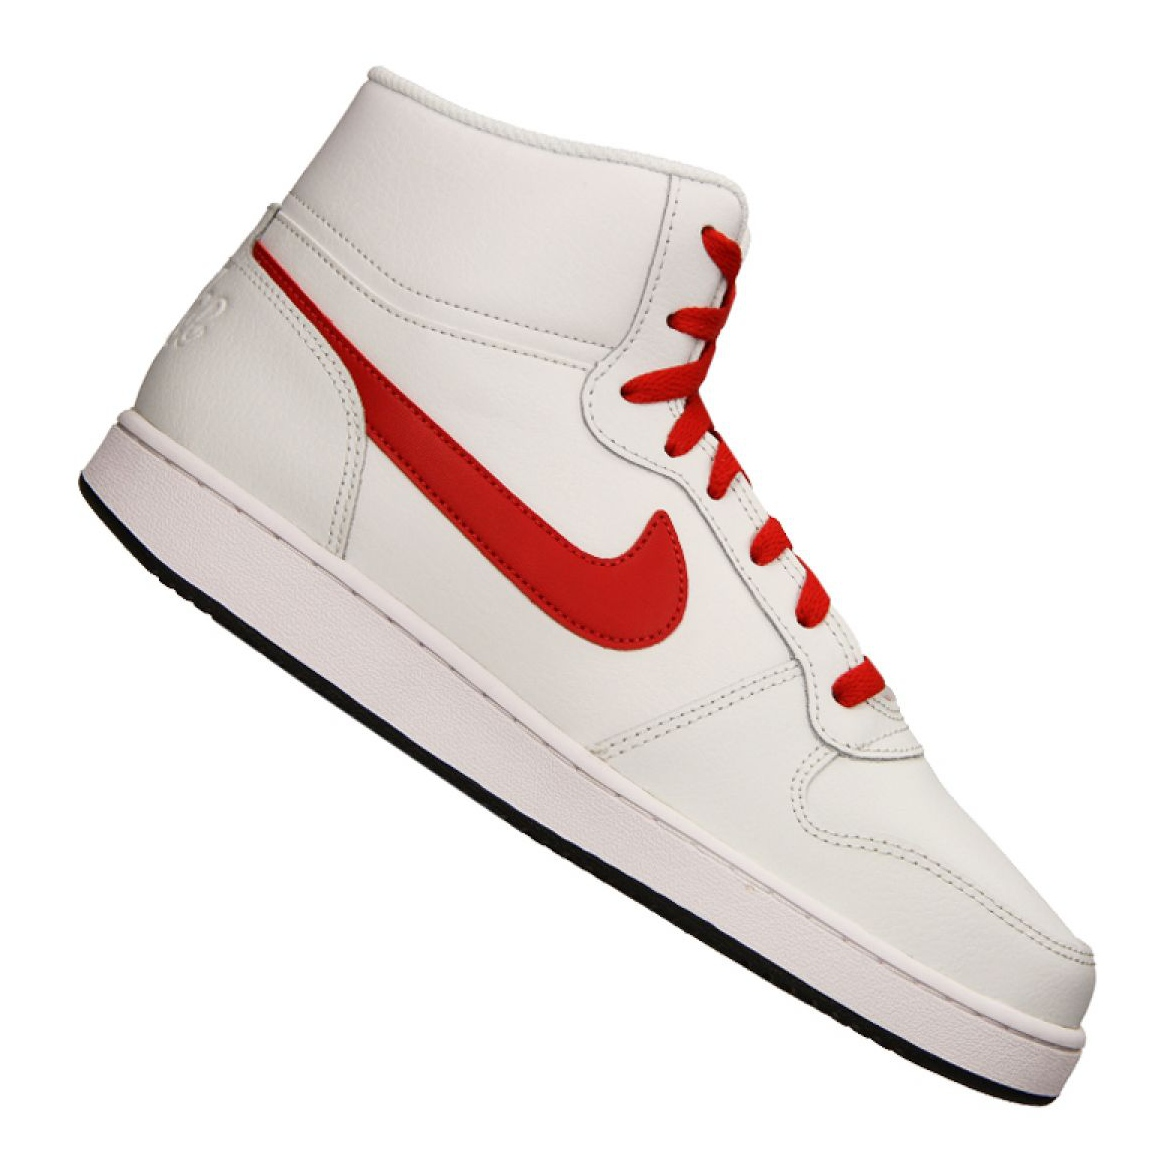 Nike Ebernon Mid M AQ1773 101 Schuhe weiß